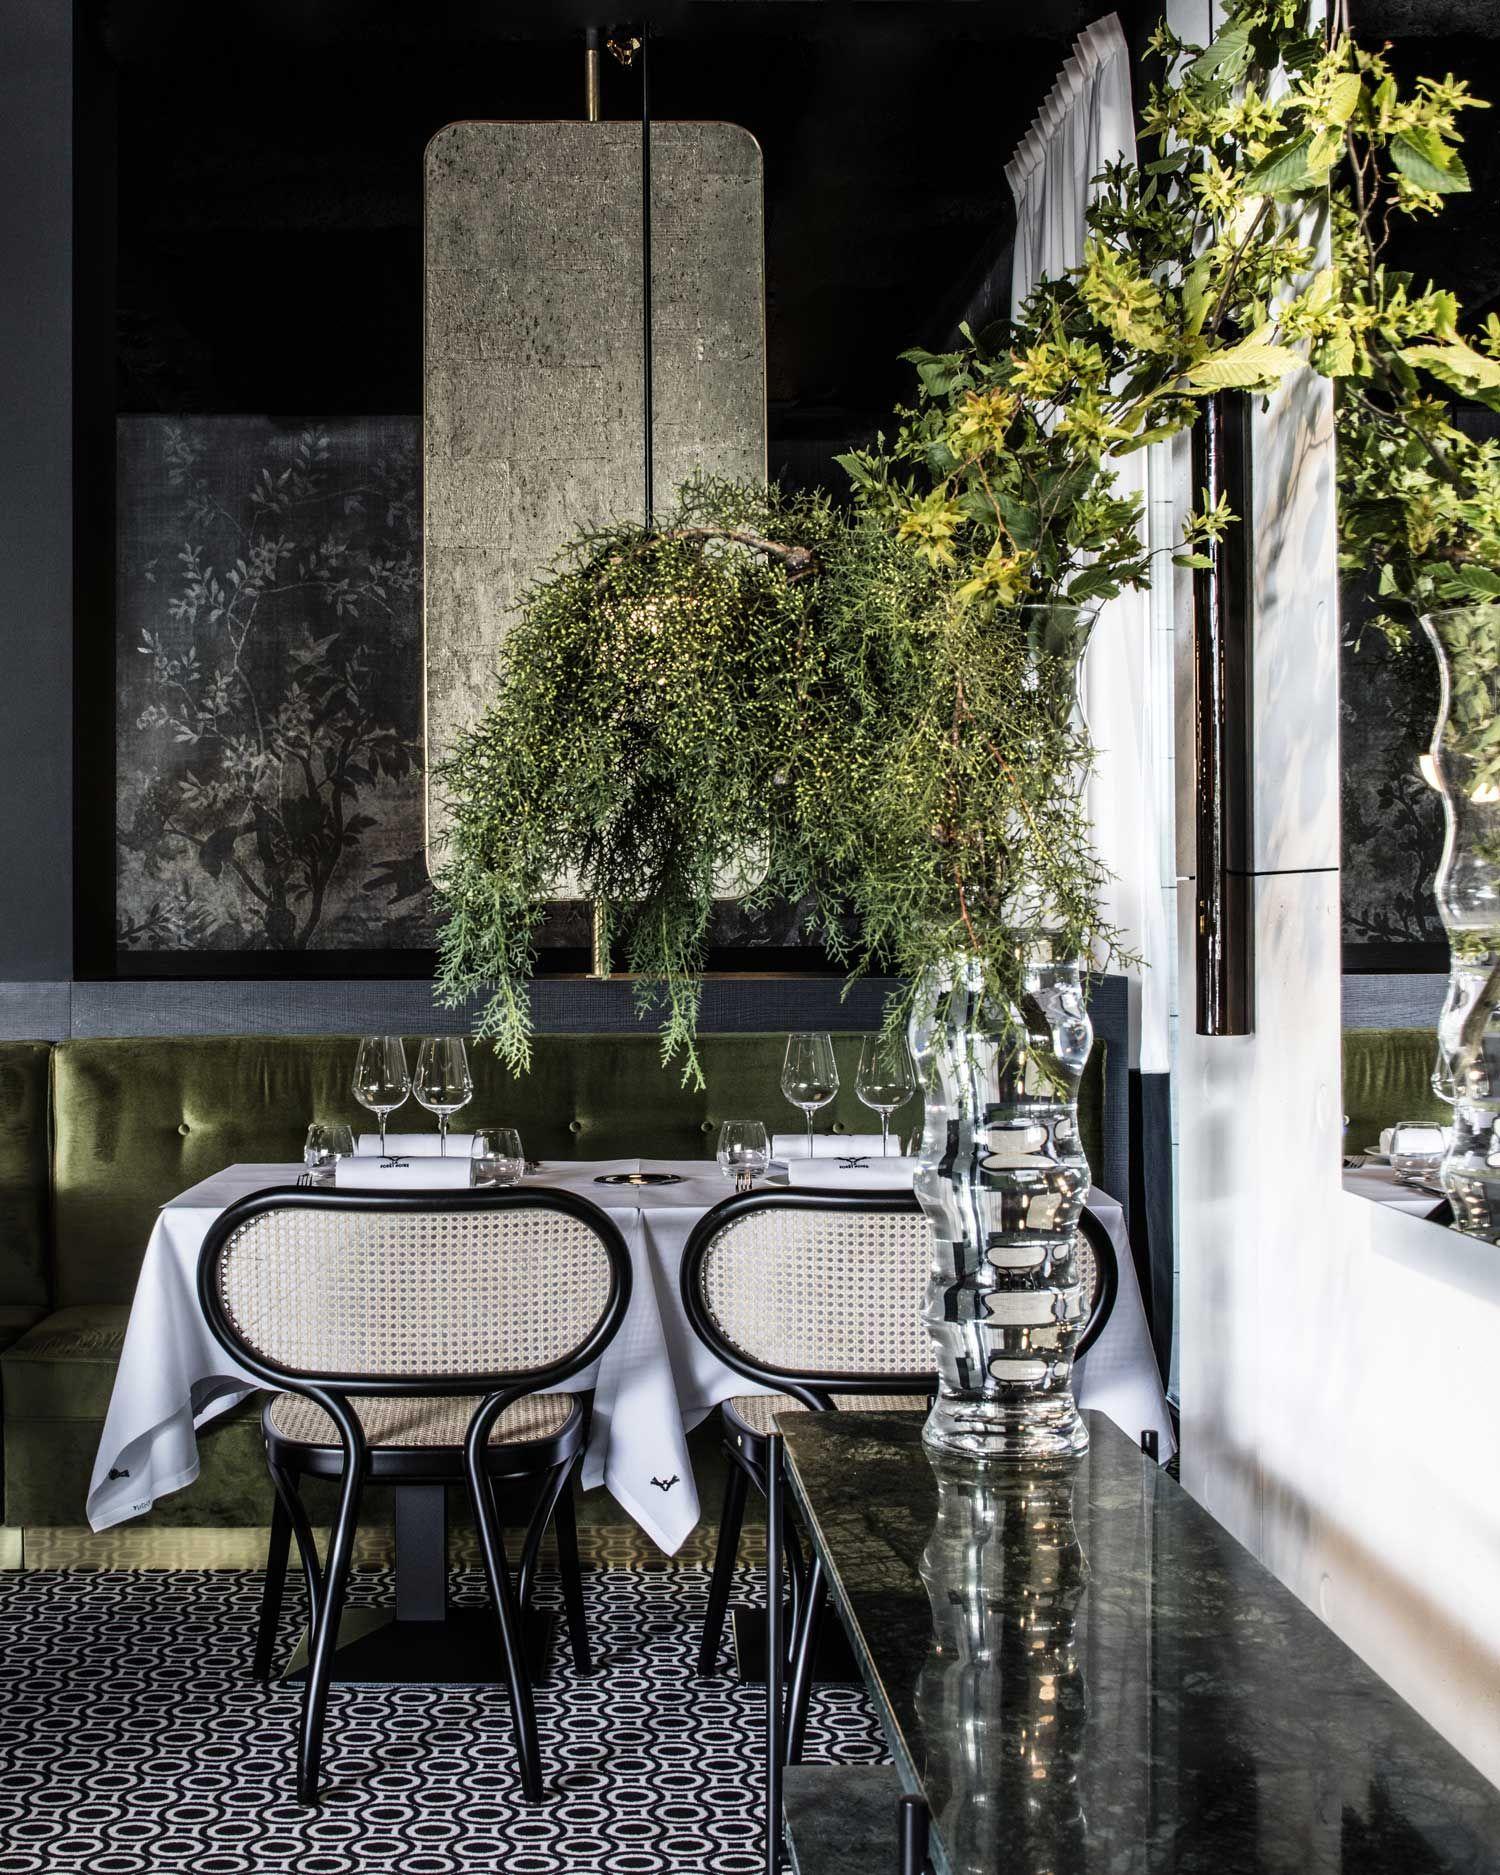 La Foret Noire Restaurant In Chaponost France By Claude